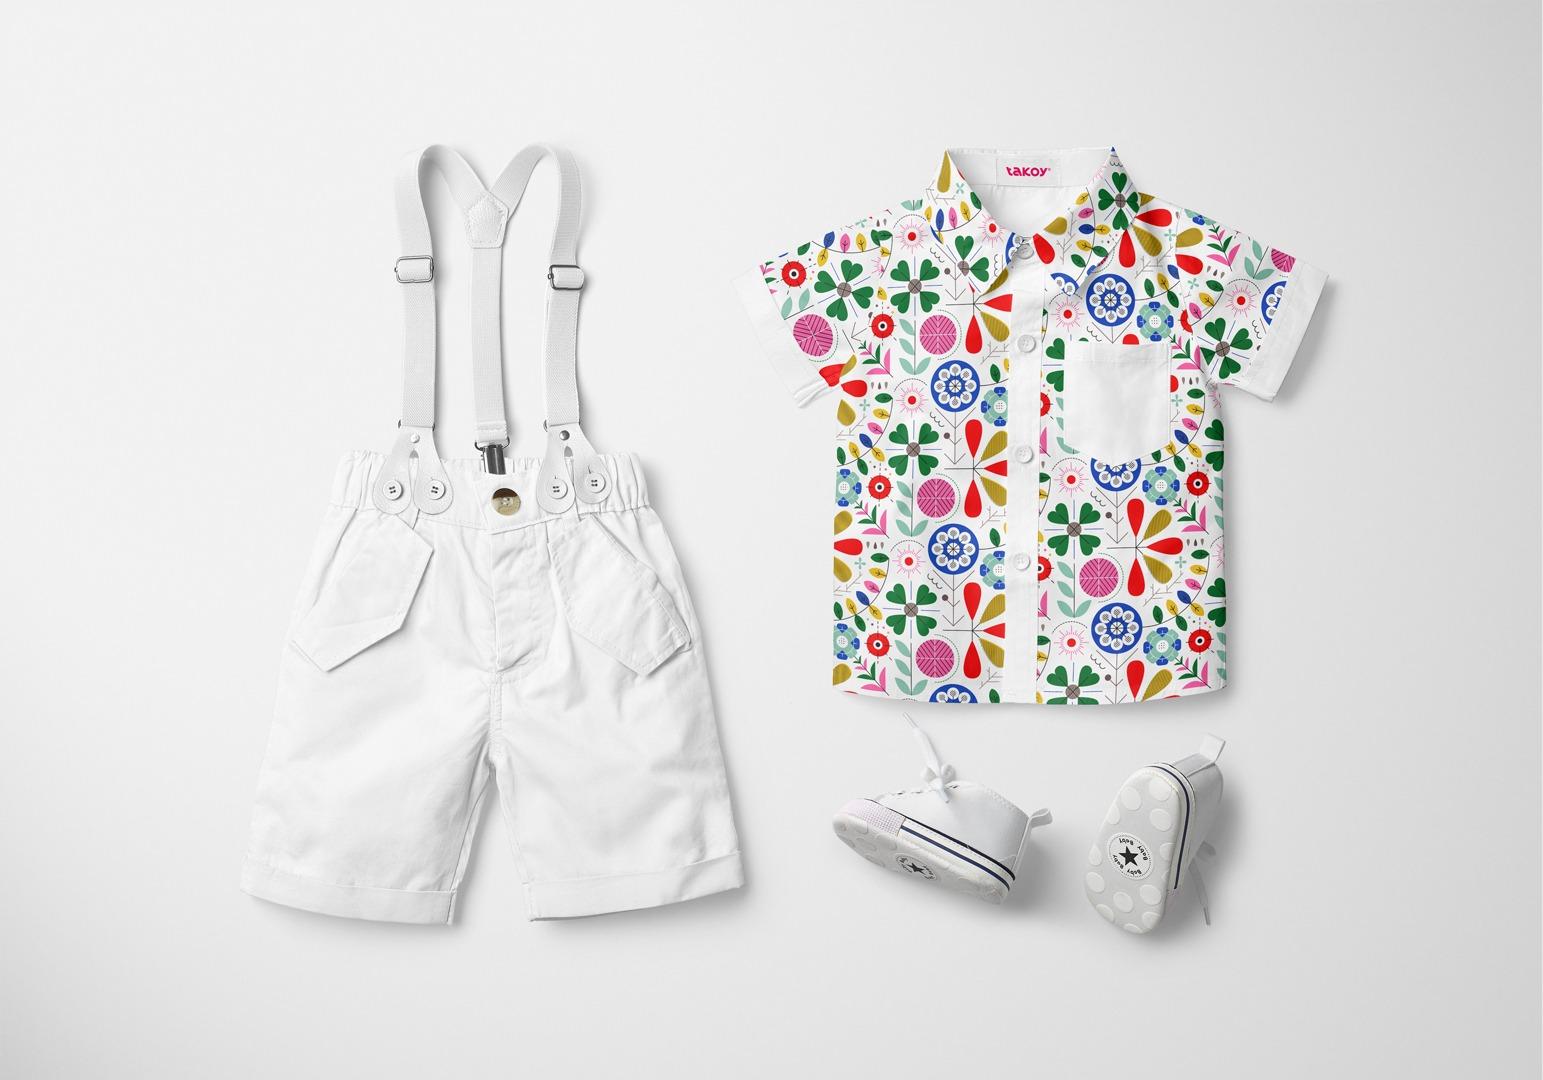 tessuto-di-cotone-premium-bianco-folk-geometrico-210-cm